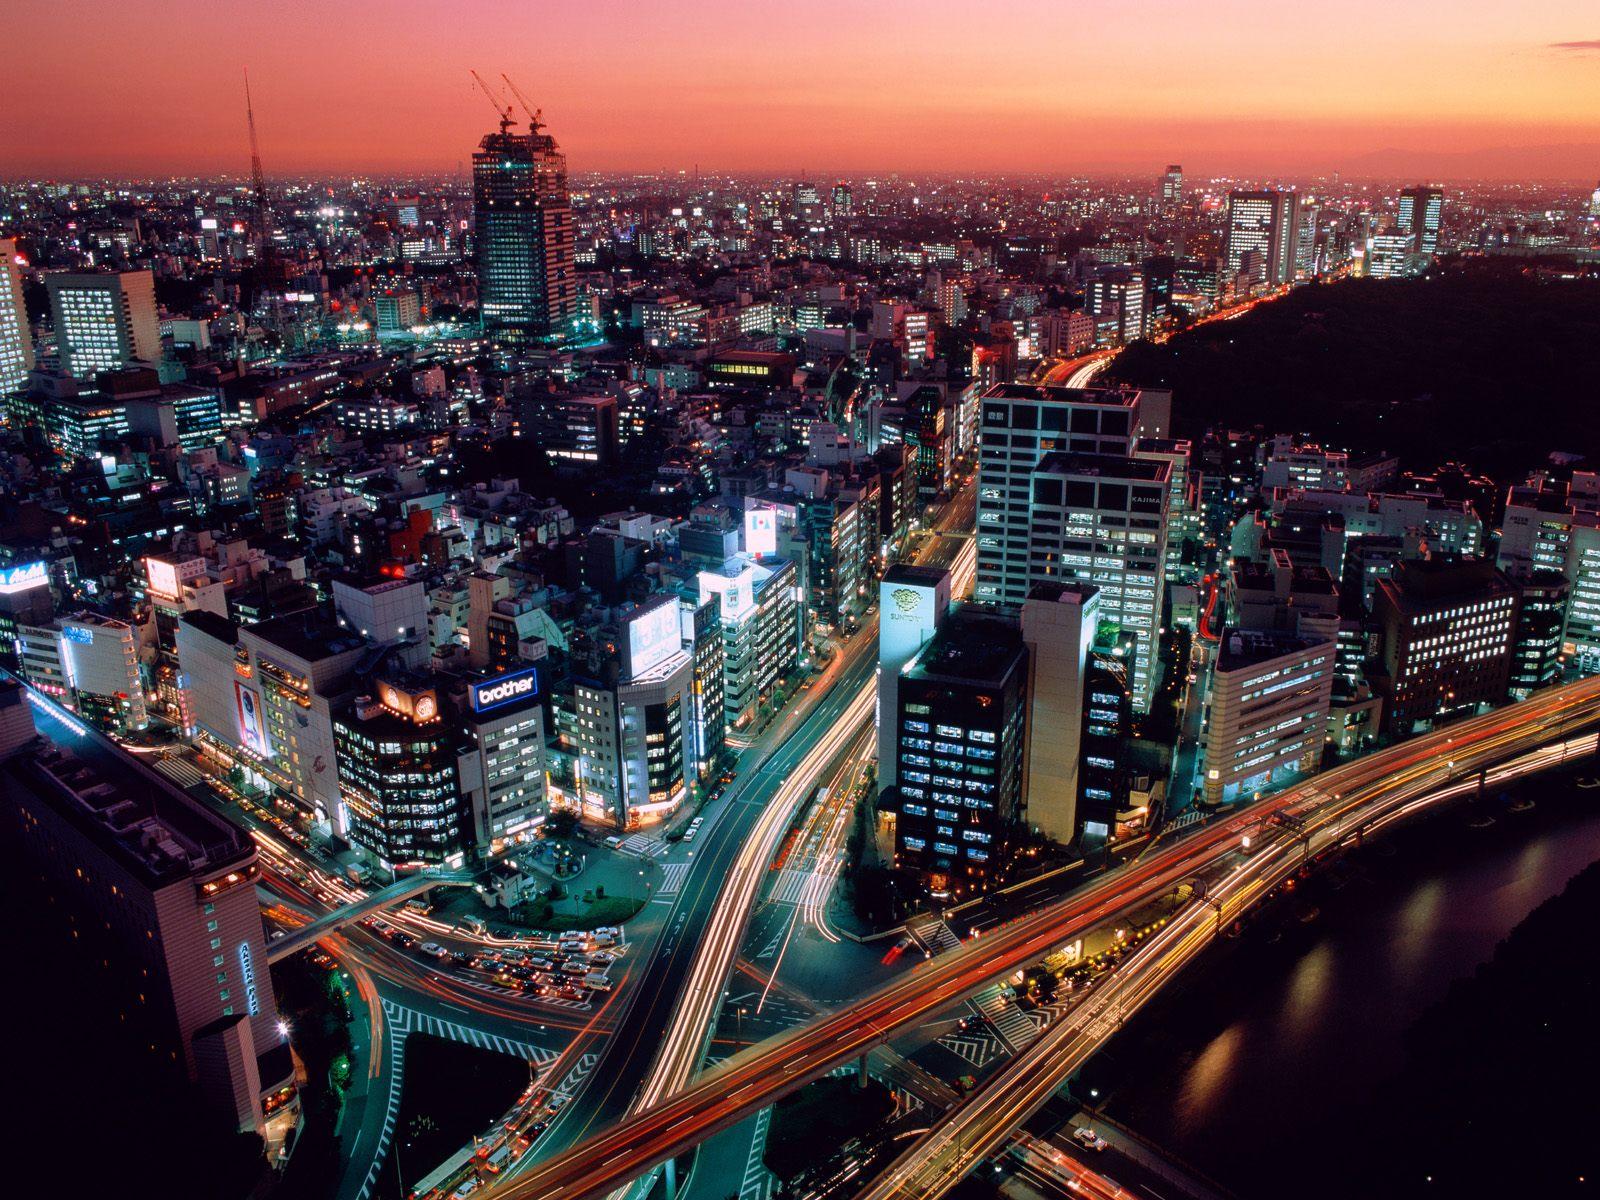 http://3.bp.blogspot.com/-5uFVa1vezjk/TadCSFLoNII/AAAAAAAAAWk/PLcqi2PRnYw/s1600/Dusk+Tokyo+Japan.jpg